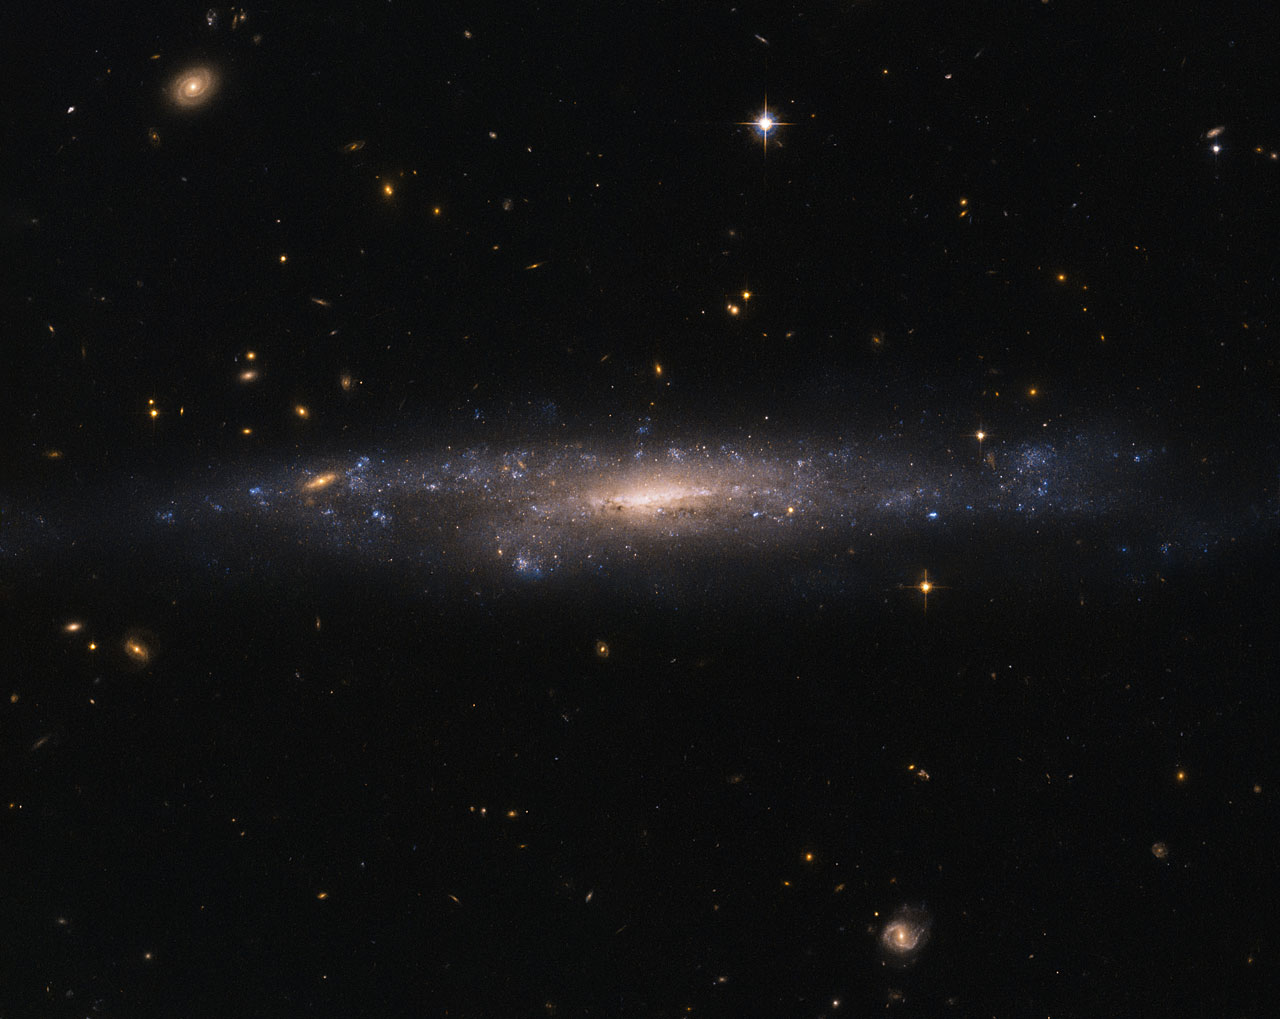 Hubble Sees Galaxy Hiding in the Night Sky | NASA